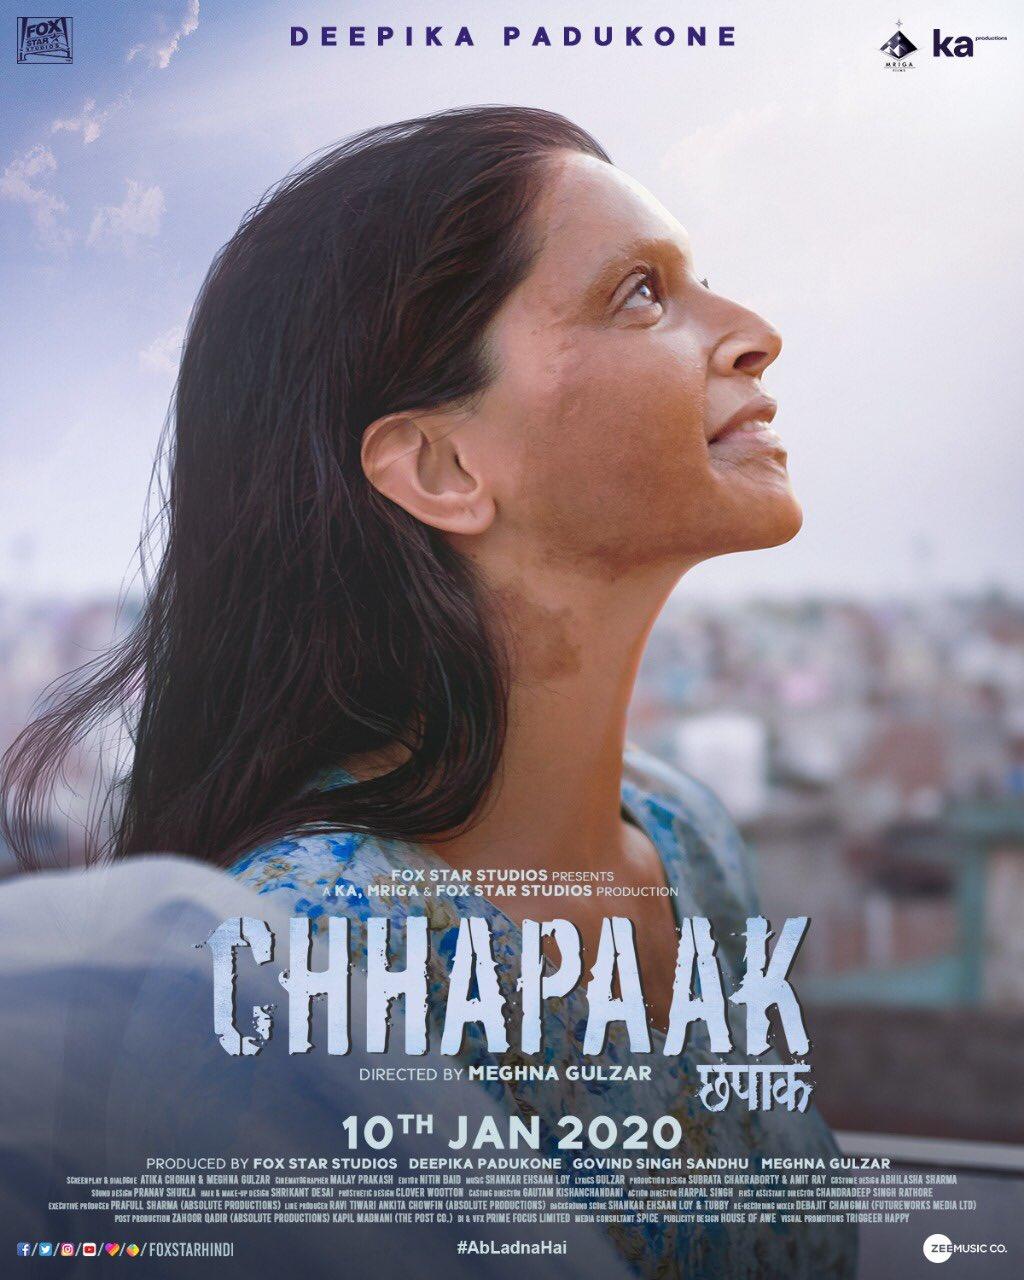 Chhapaak (2020) Hindi Pre-DvDRip - 480P   720P - x264 - 400MB   700MB   1.2GB - Download & Watch Online  Movie Poster - mlsbd